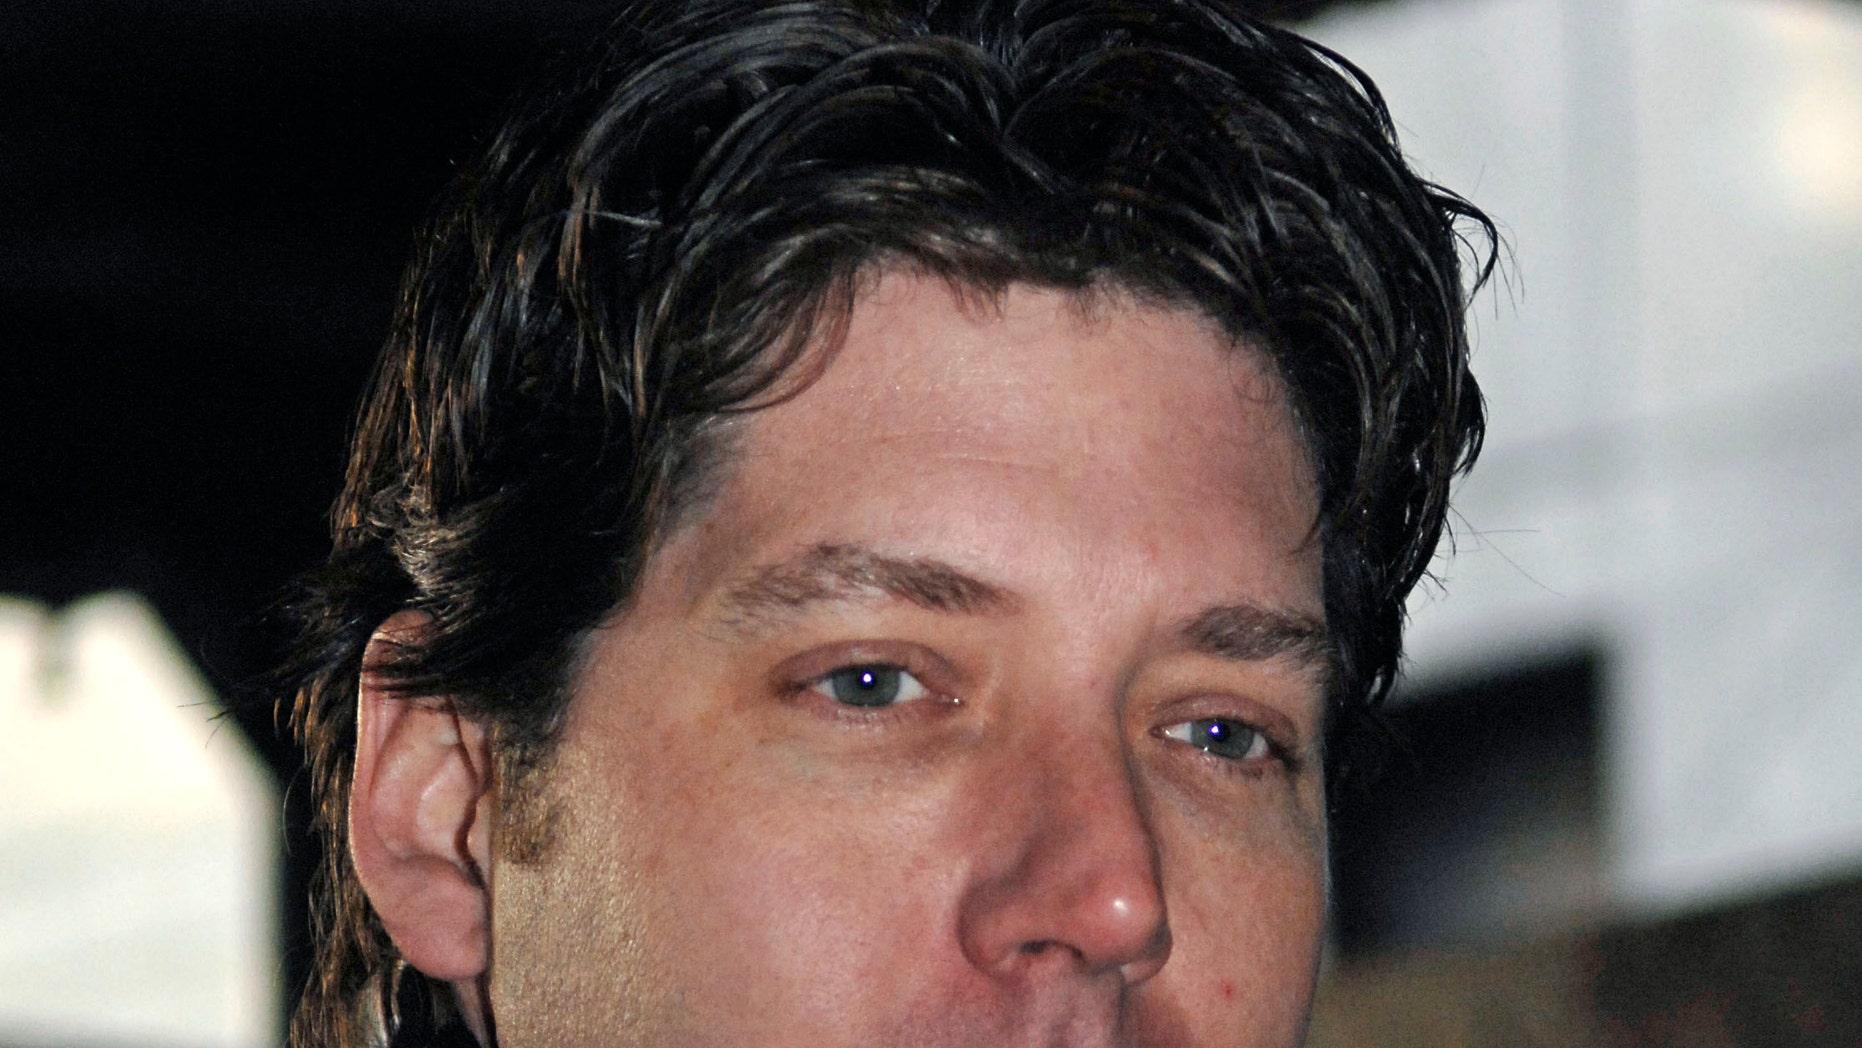 FILE - Actor James Barbour enters Manhattan criminal court, Wednesday, Dec. 6, 2006, in New York.